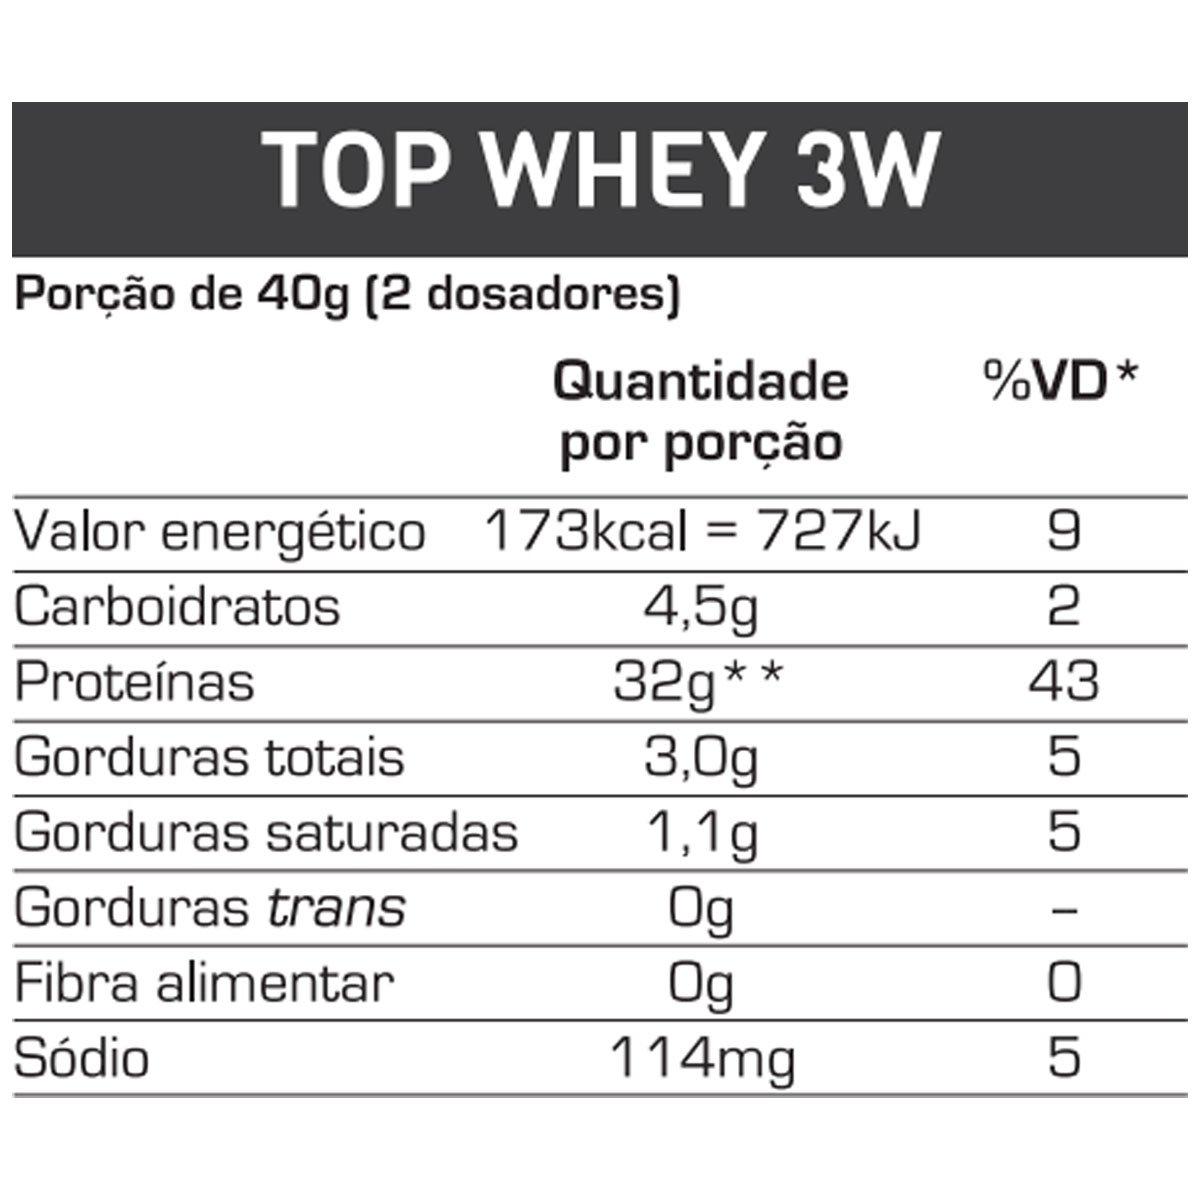 TopWay Suplementos - Top Whey 3w 900g - Max Titanium - Tabela Nutricional